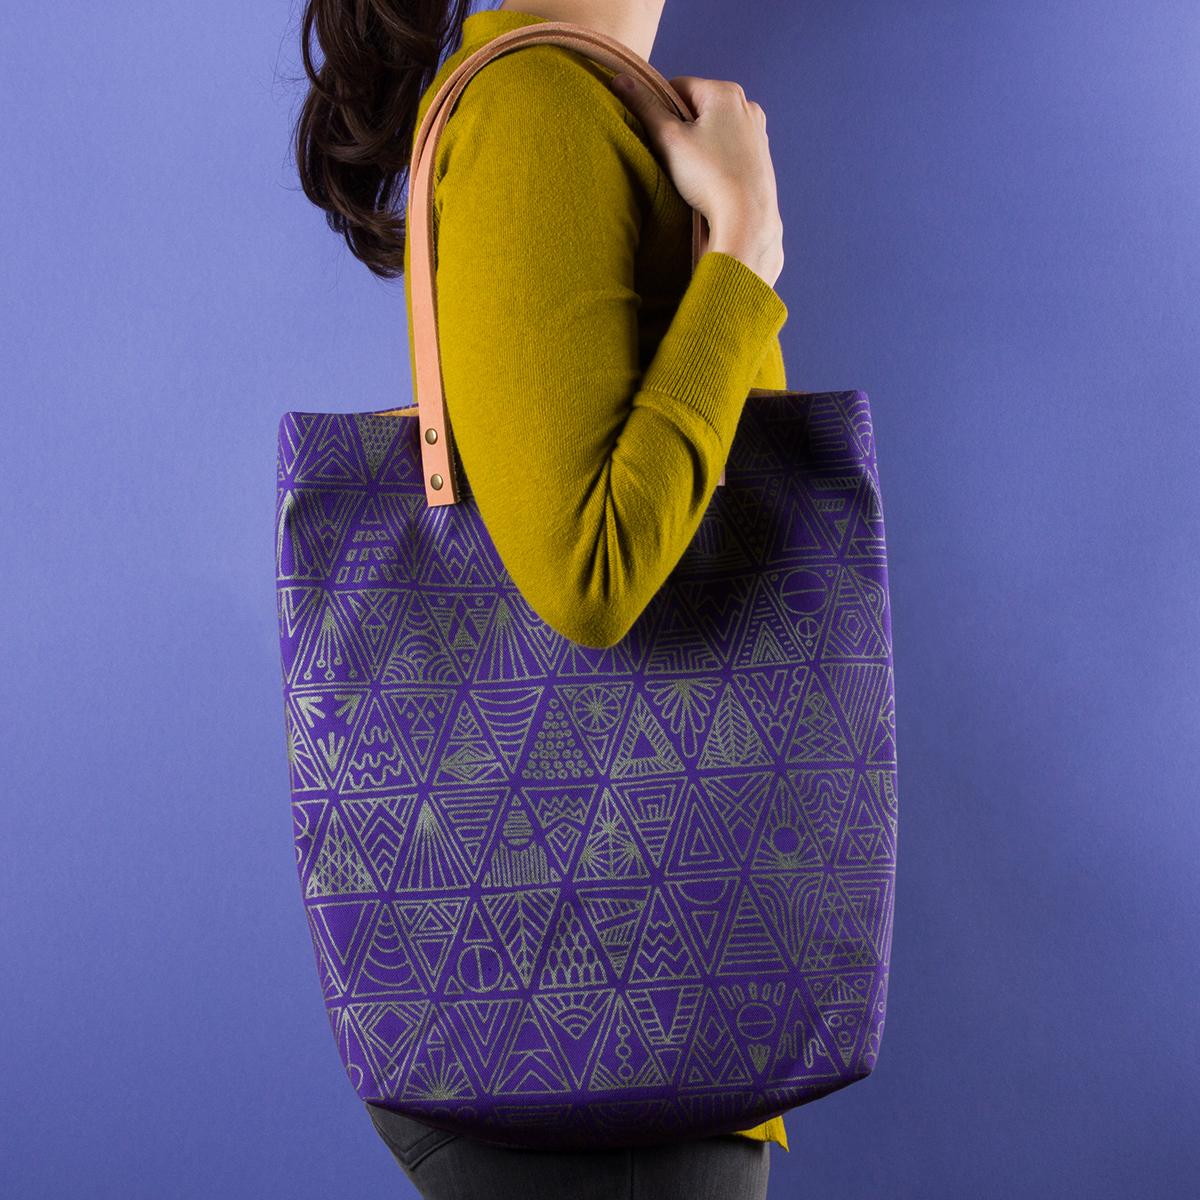 screenprint screen print handmade pattern design textile silkscreen Screenprinting Tote Bag